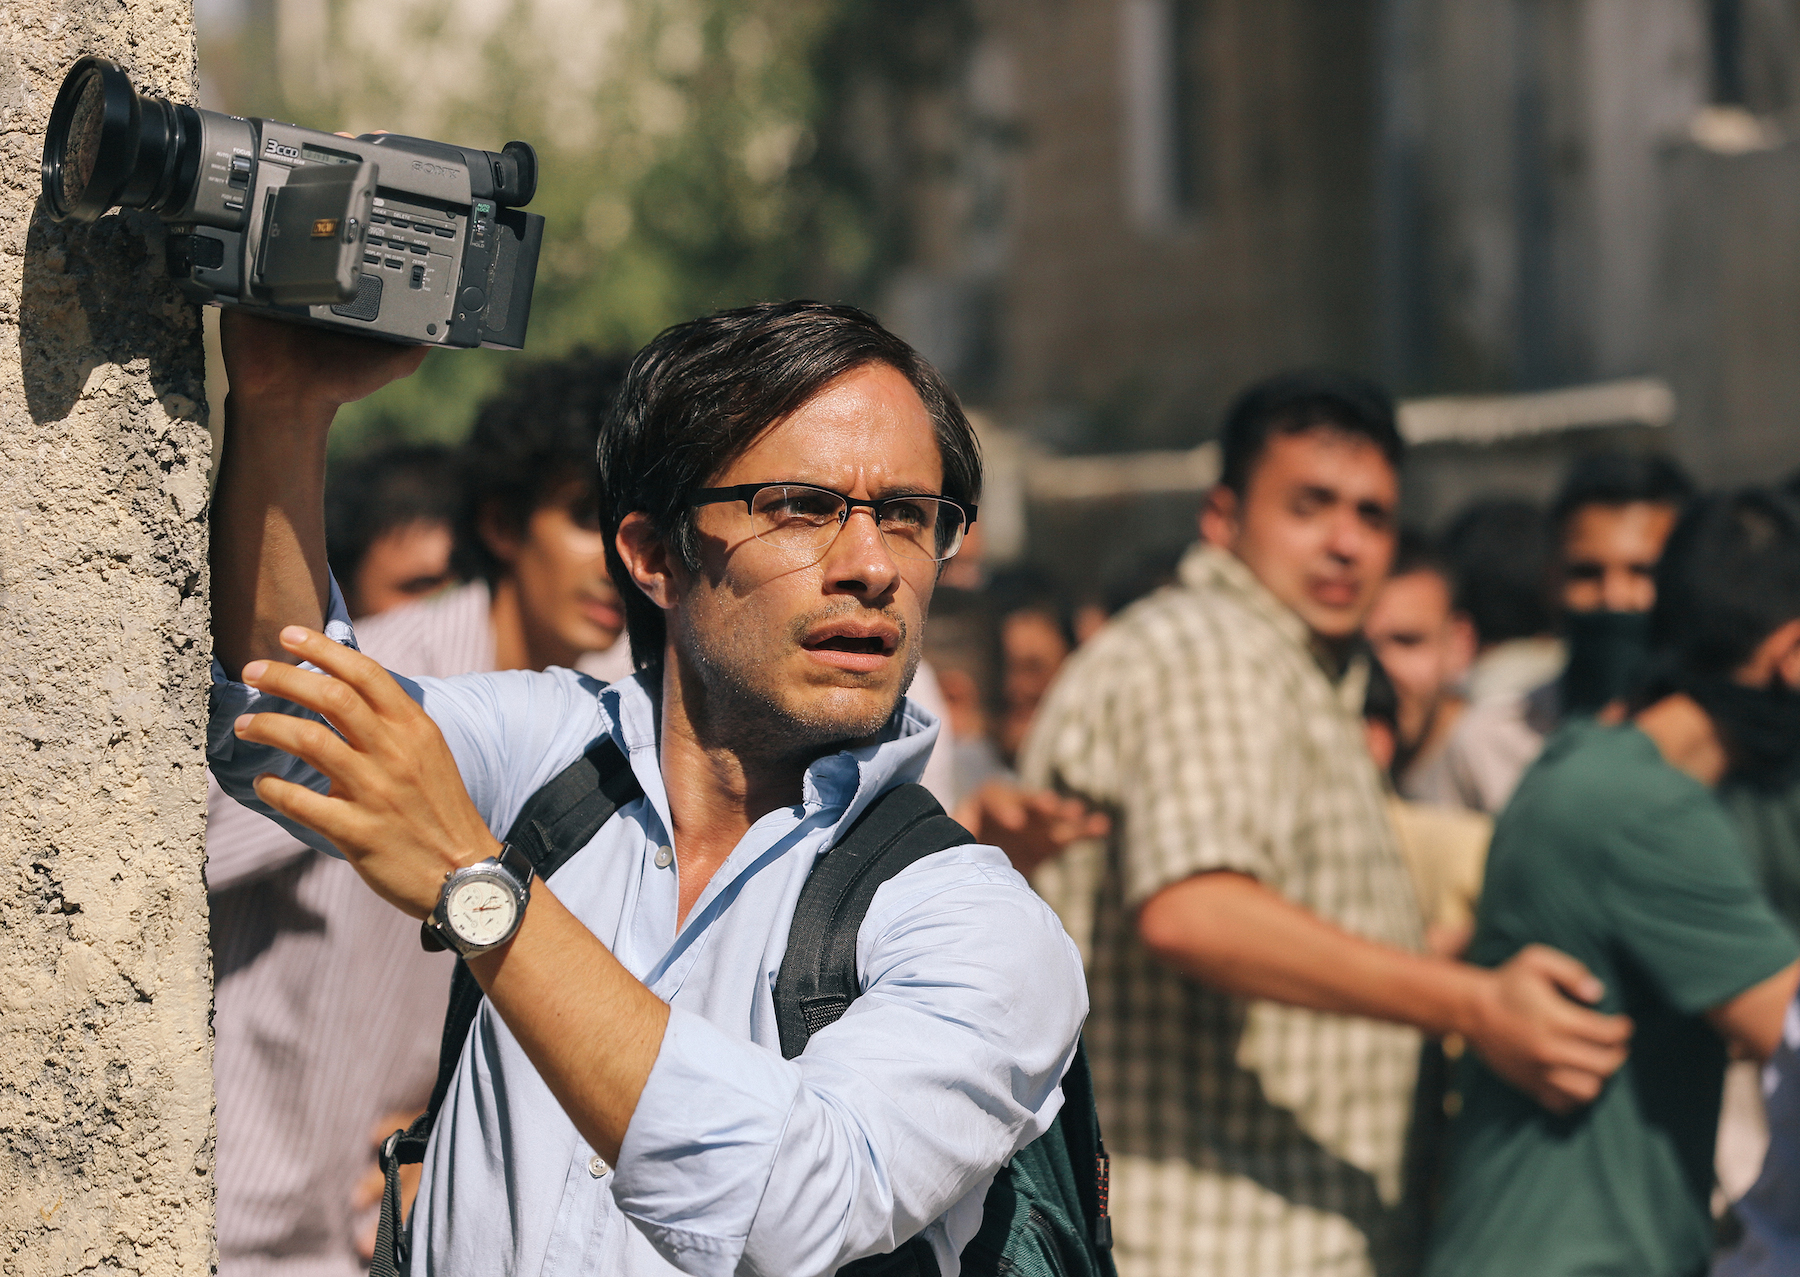 TRAILER: Gael Garcia Bernal Stars as Iranian Journalist in Jon Stewart's Intense Directorial Debut